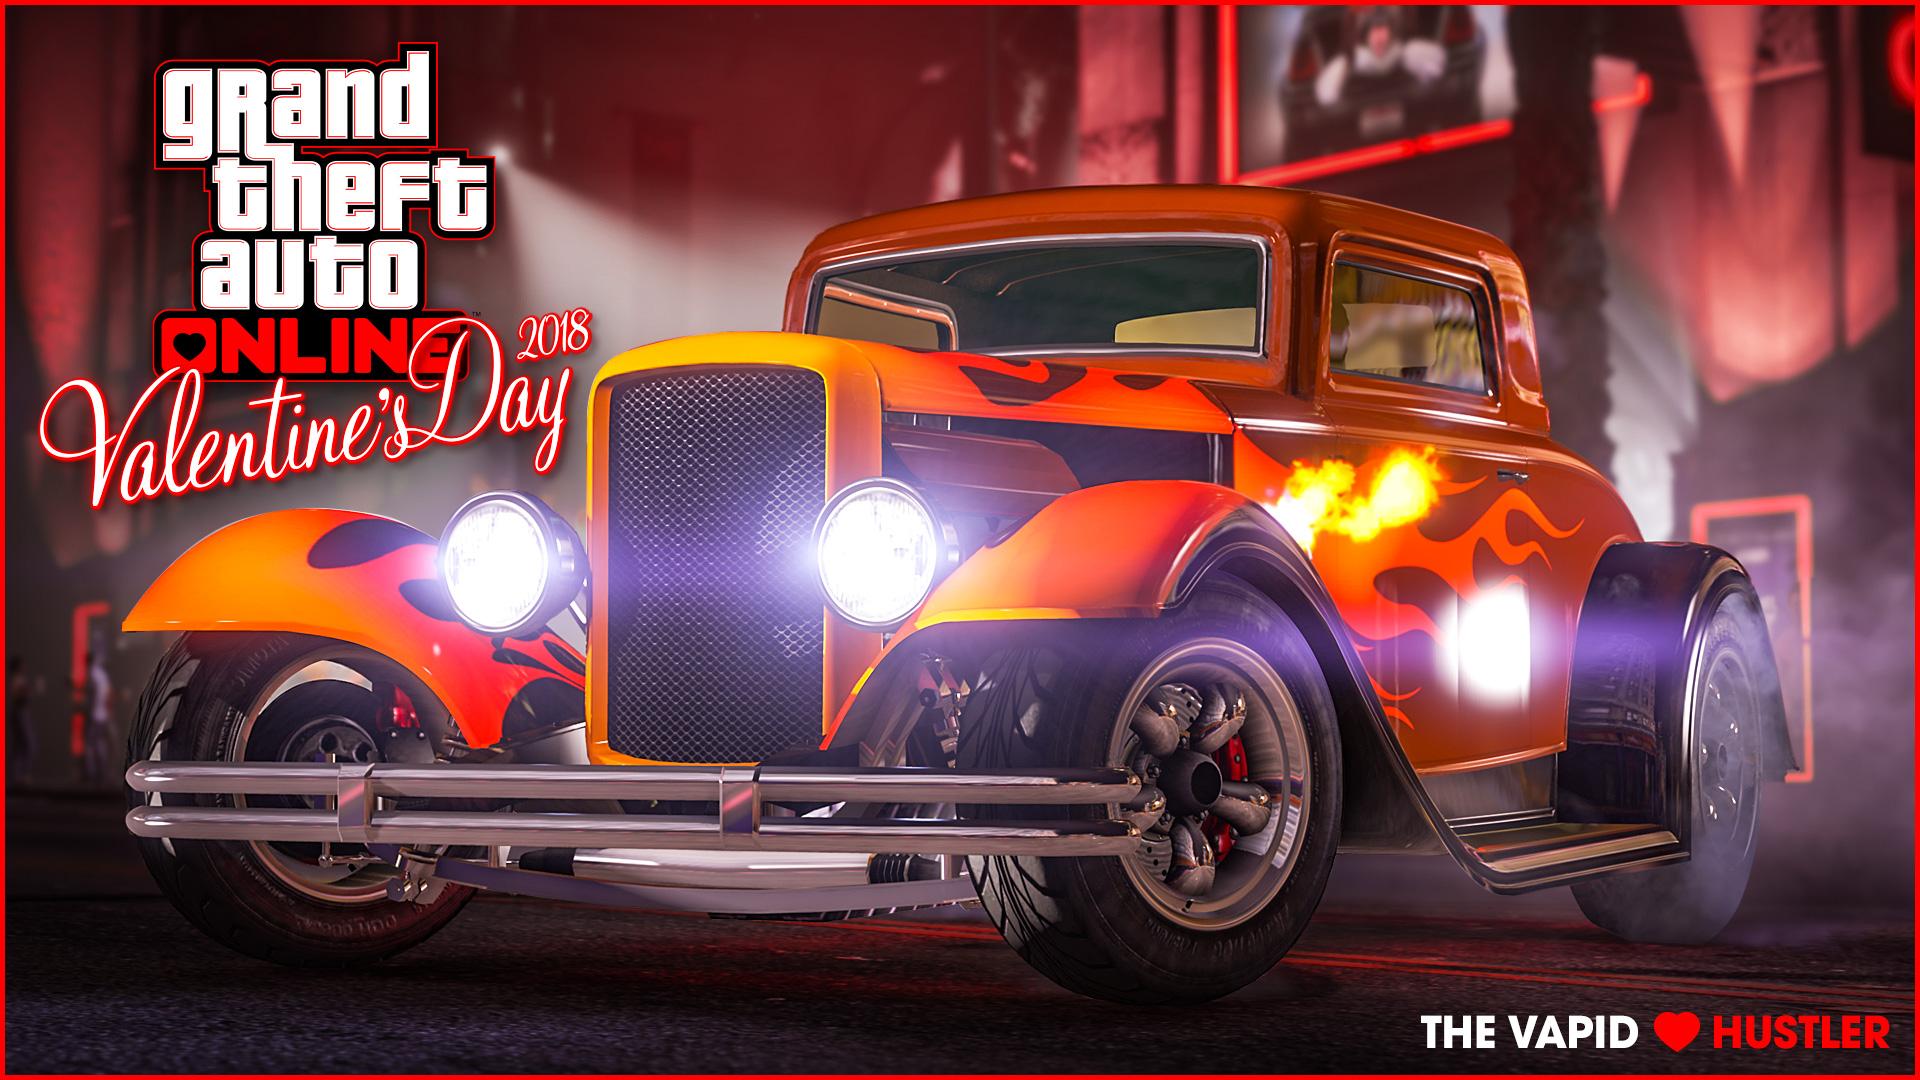 Gta 5 rp no download | Play GTA 5 Online Free No Download